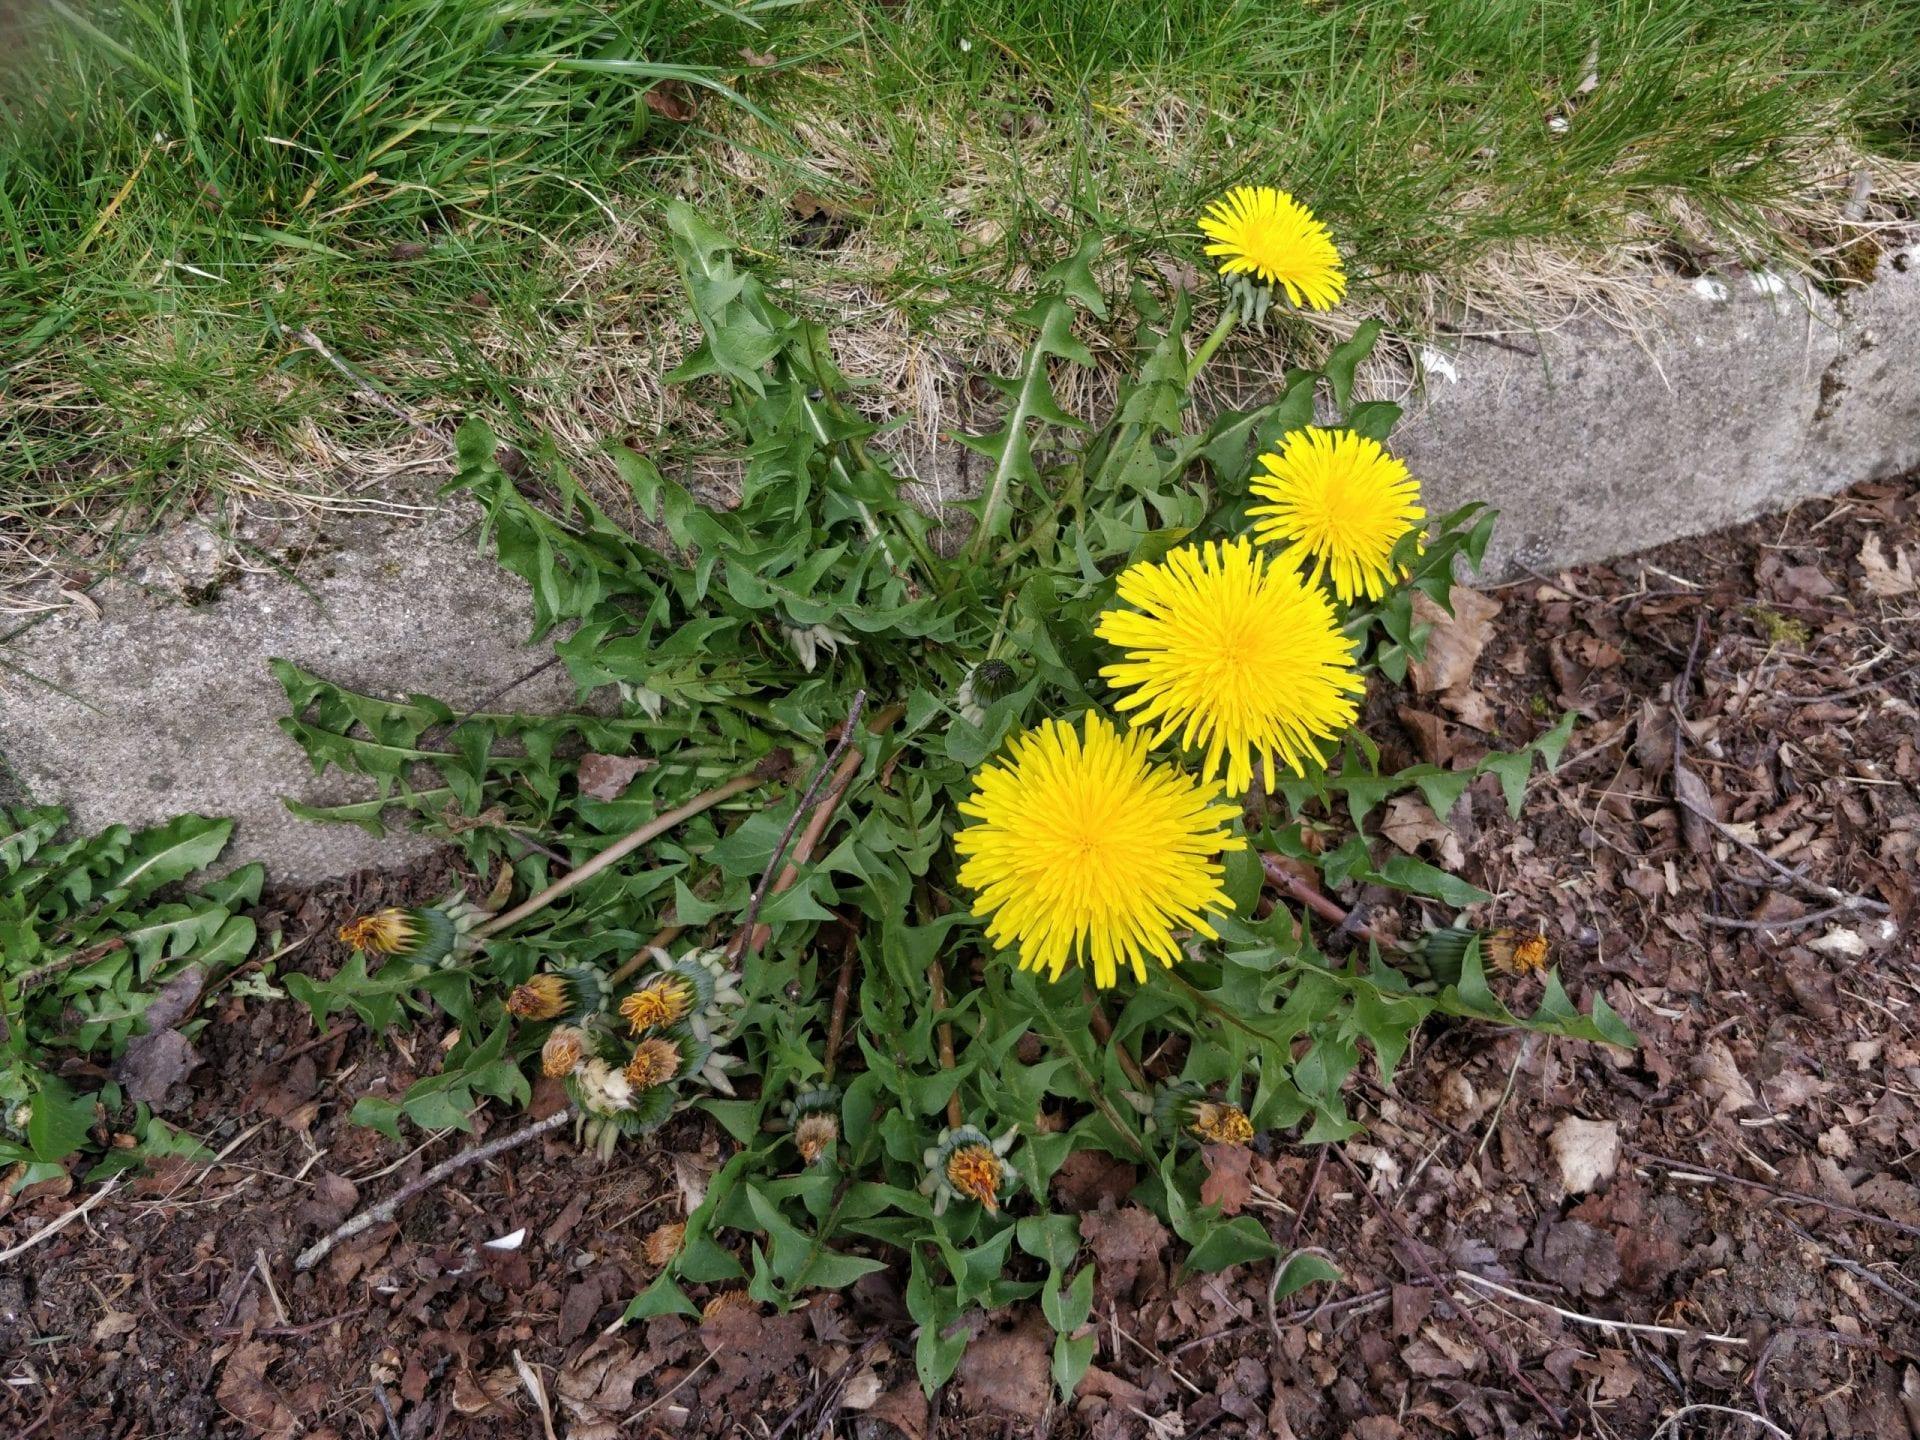 dandelion-flower-cluster-on-roadside